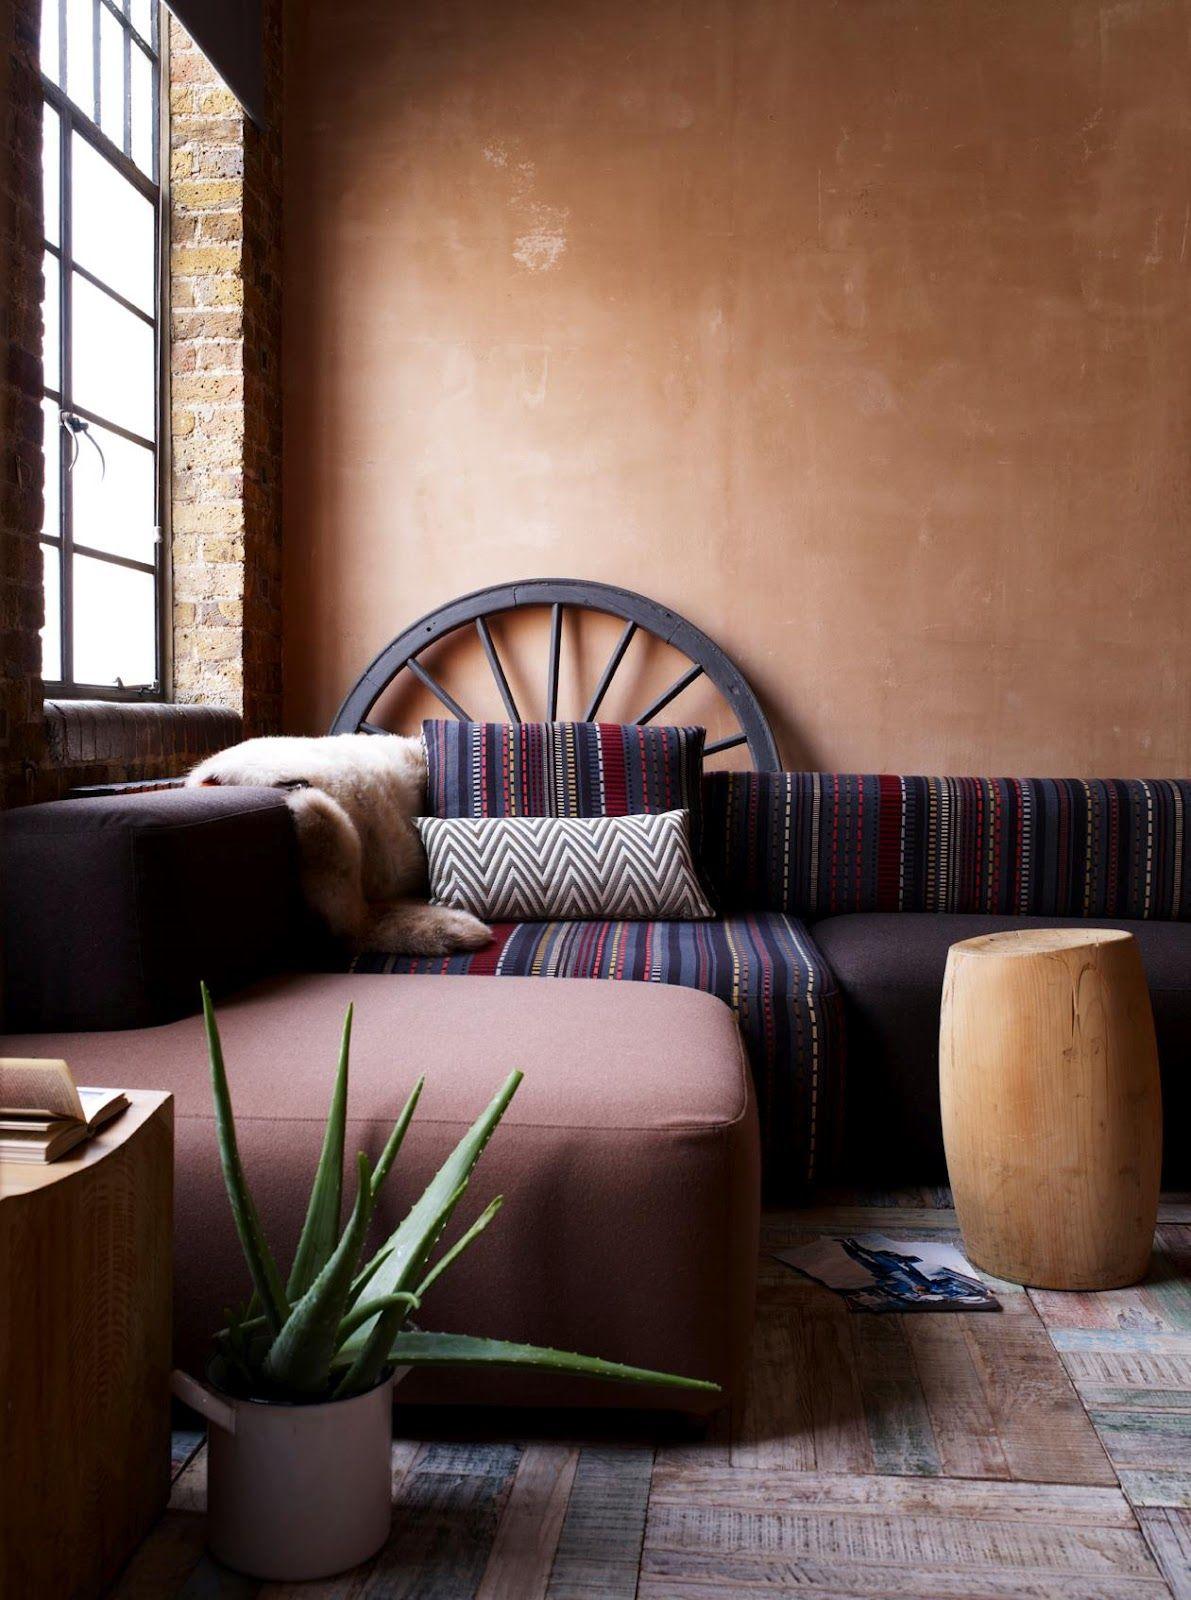 Southwest decor living room  Southwestern style sofa interior design sofa upholstery fabric